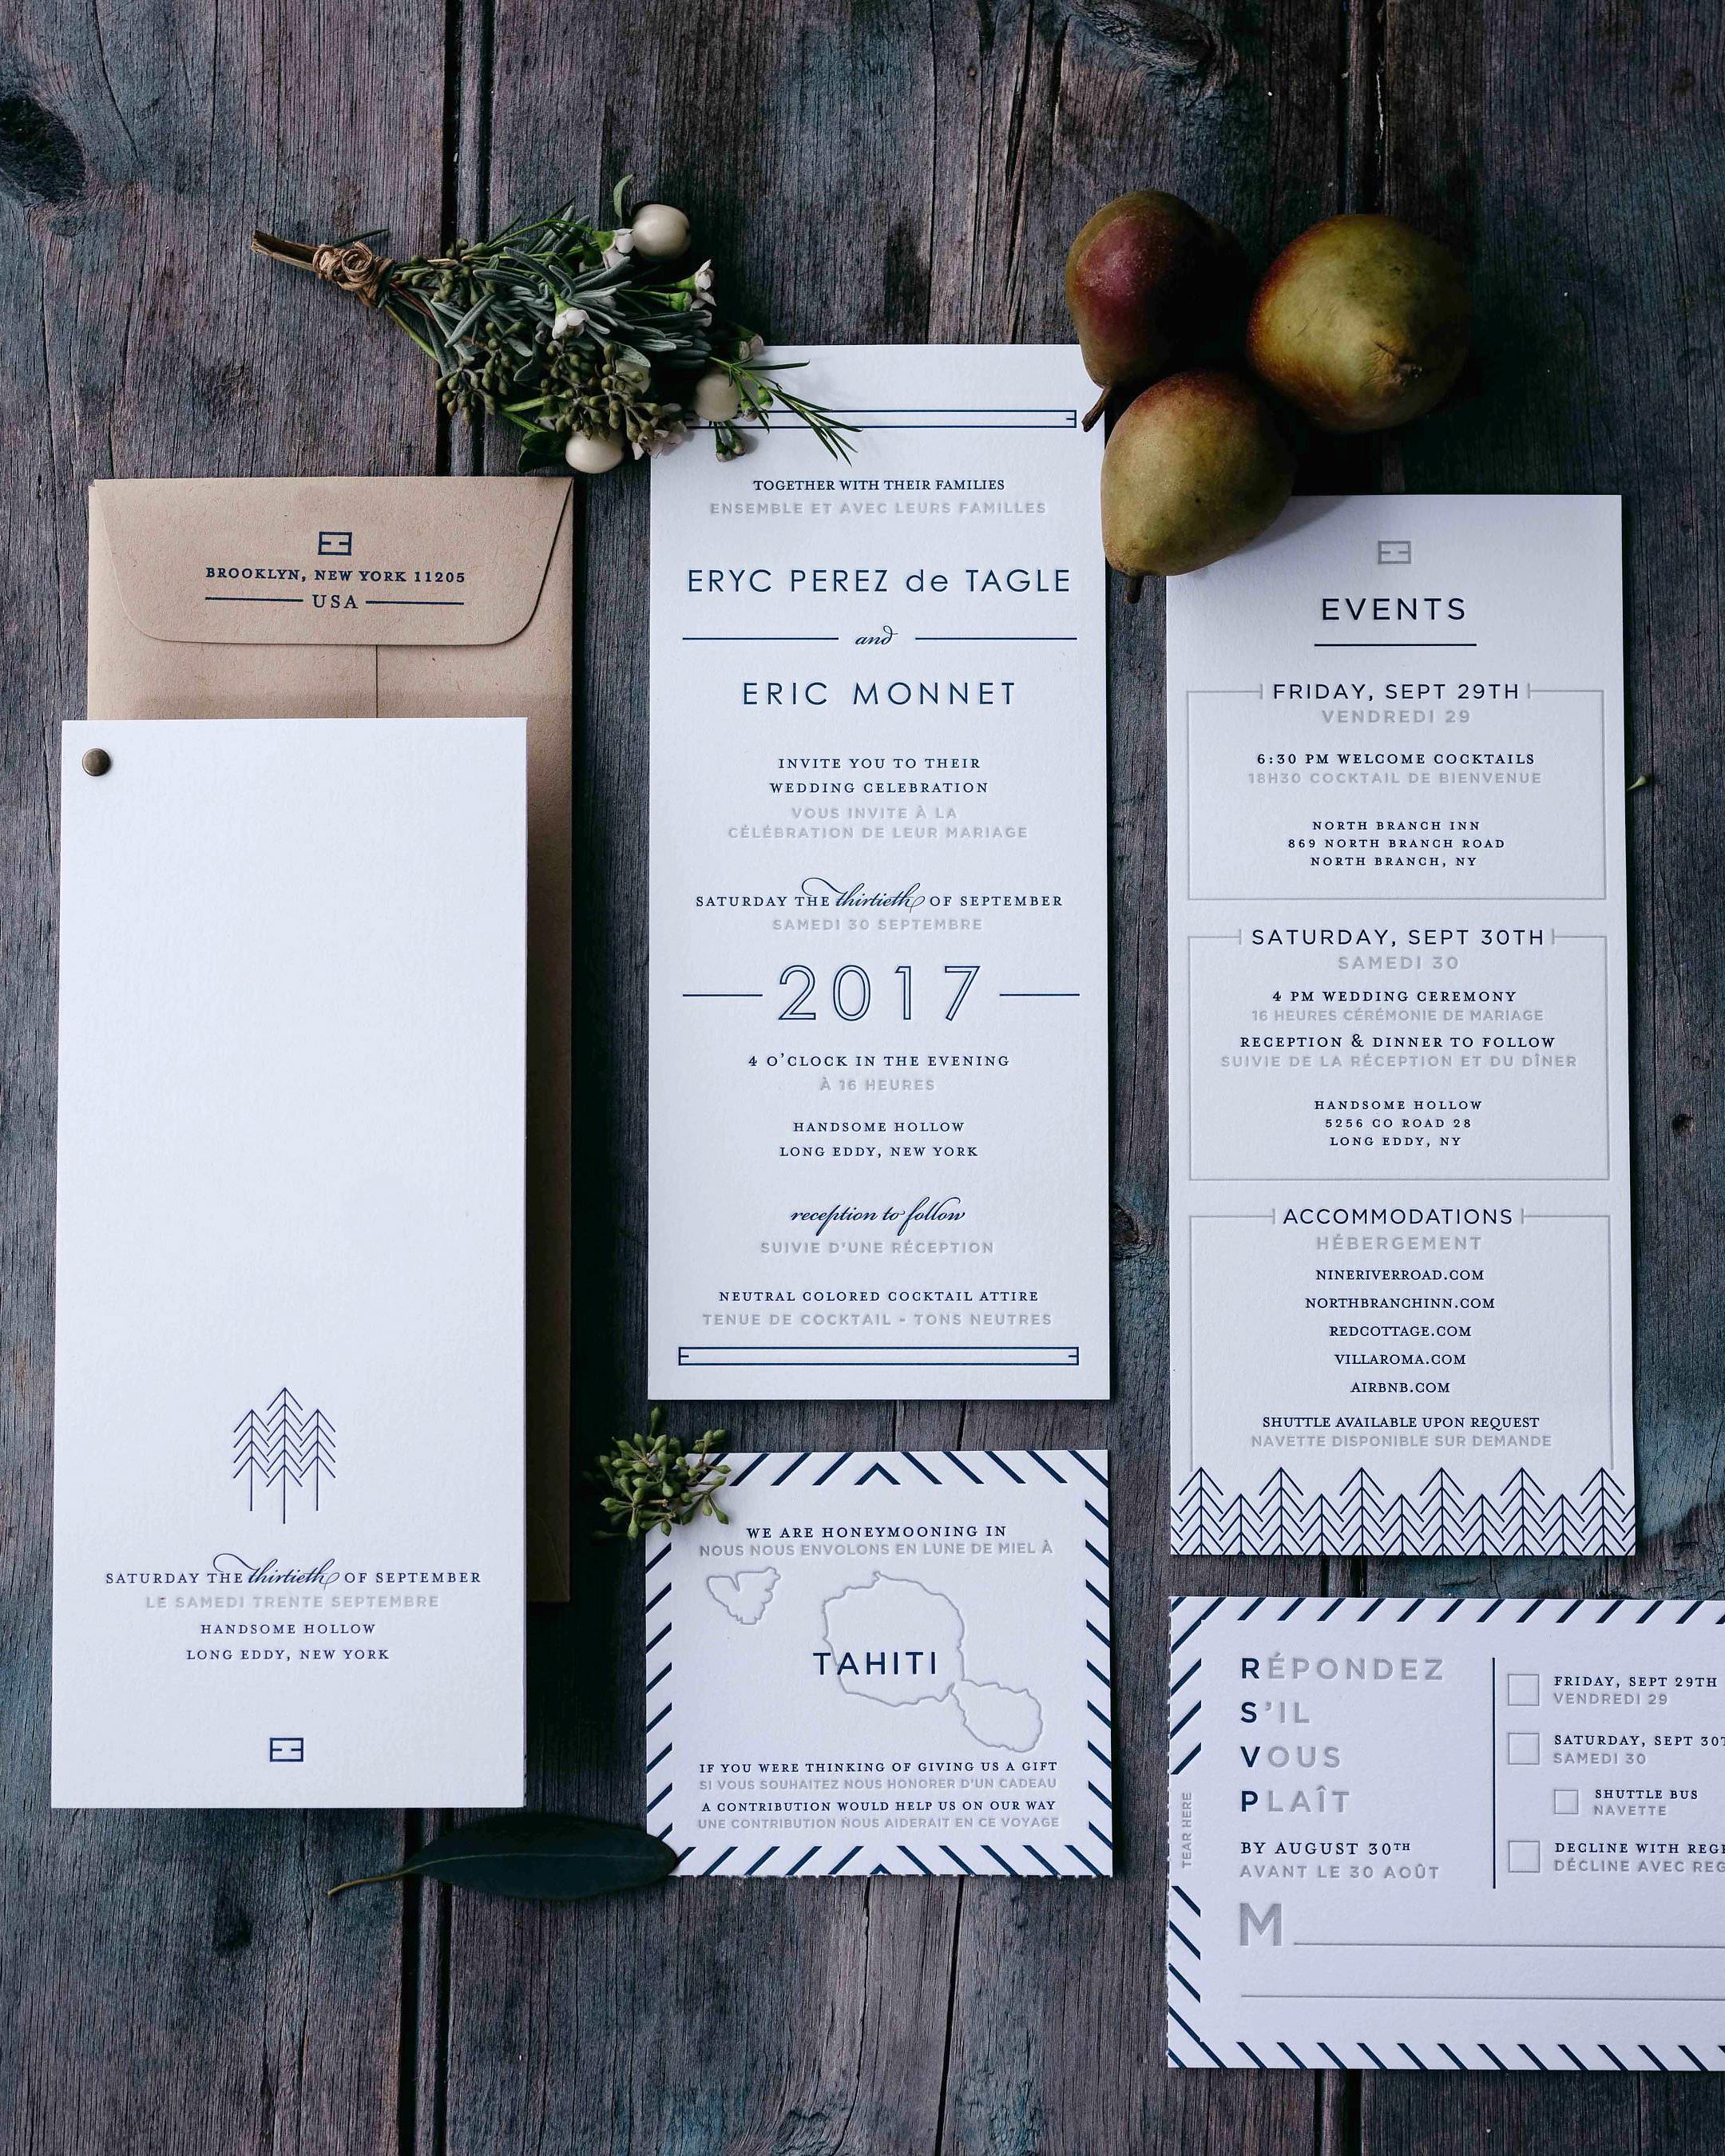 eric eryc wedding invitation